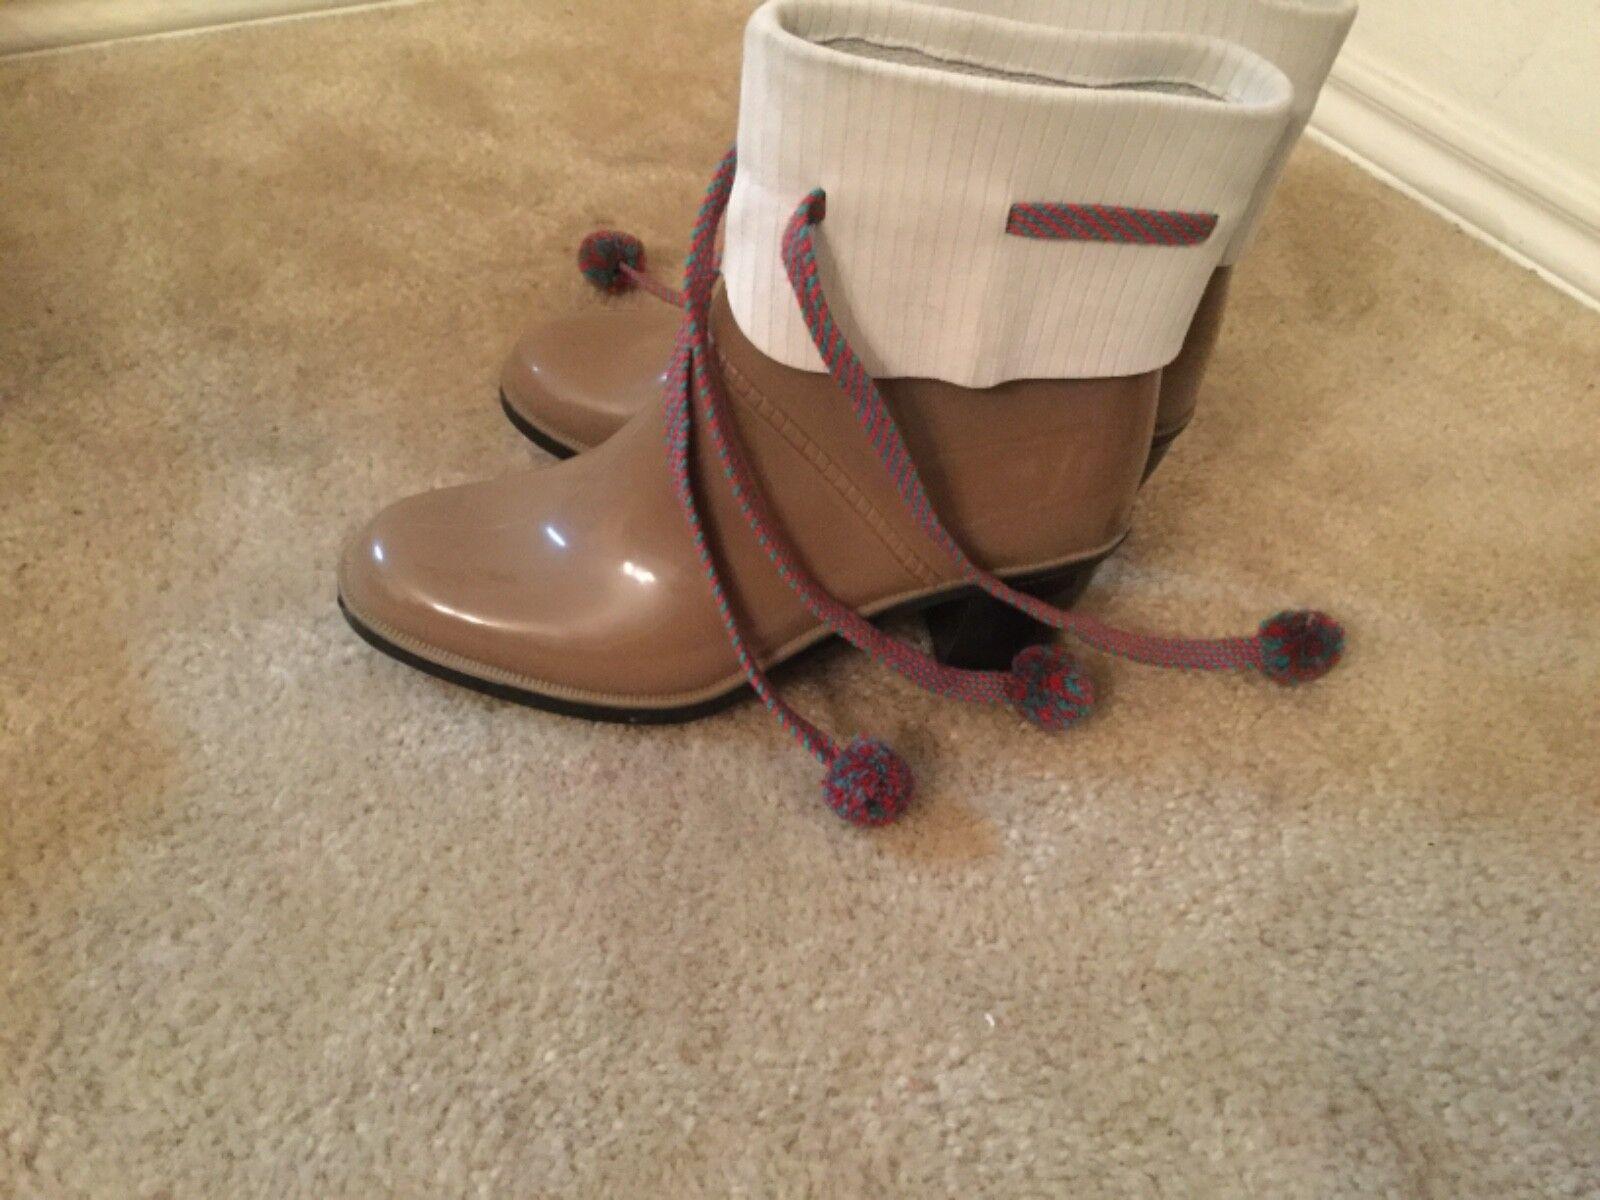 Marc Jacobs Multicolor Heel ankle Rubber Rain Boots size 7 / 38